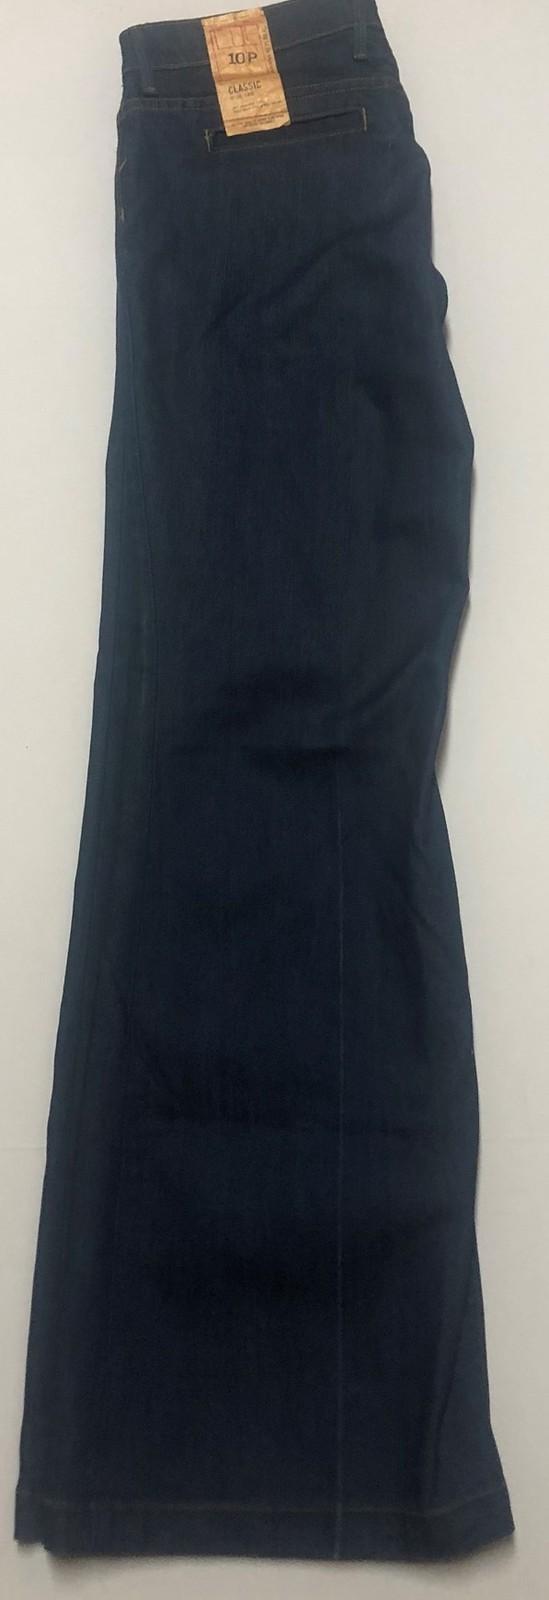 Banana Republic Classic Jeans Sz 10P Stretch Medium Blue Wide Leg image 6